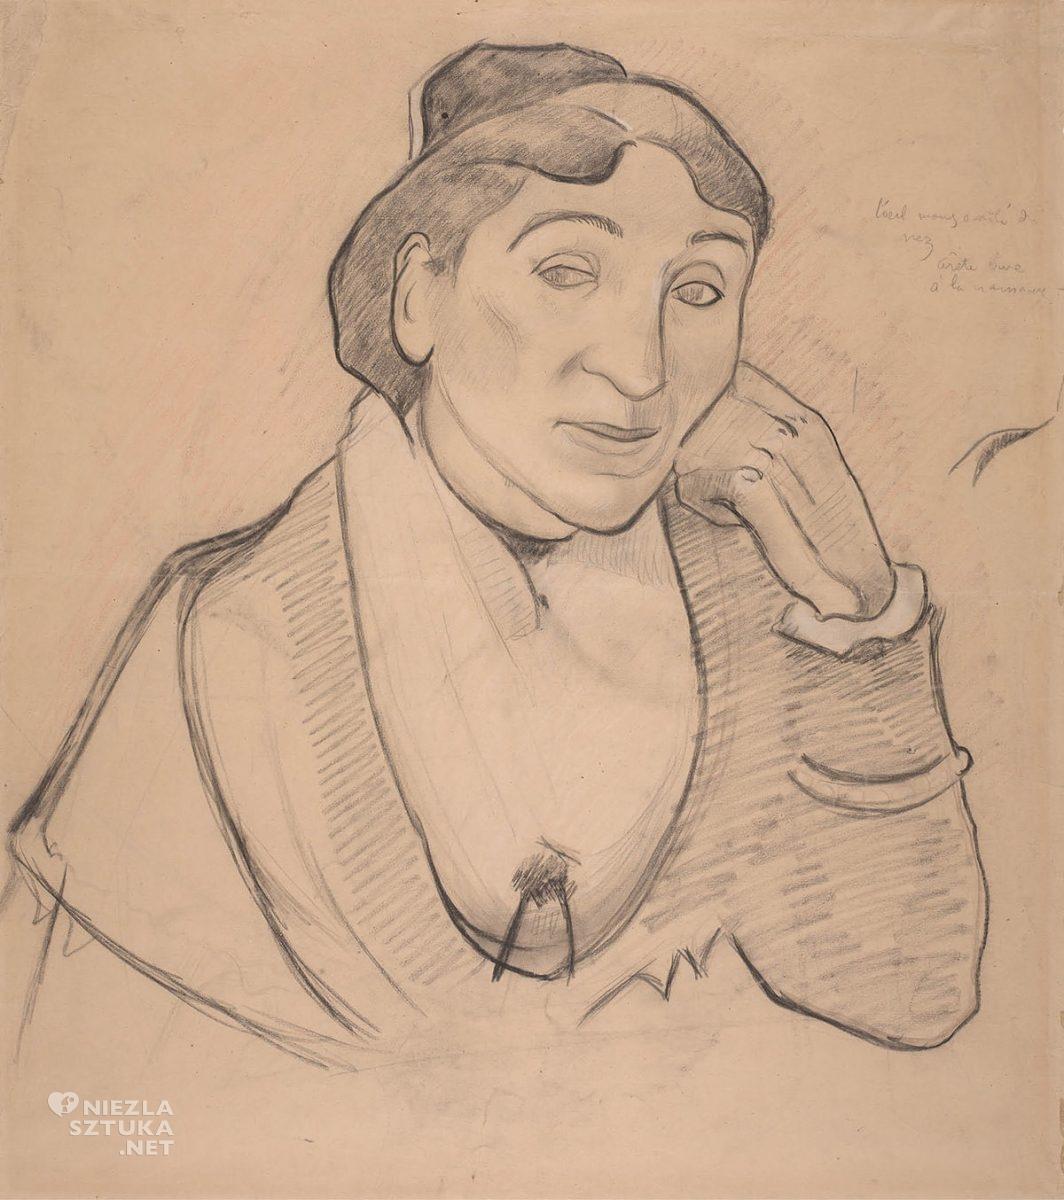 Paul Gauguin, Arlezjanka. Pani Ginoux, Kobieta z Arles, Vincent van Gogh, Niezła Sztuka